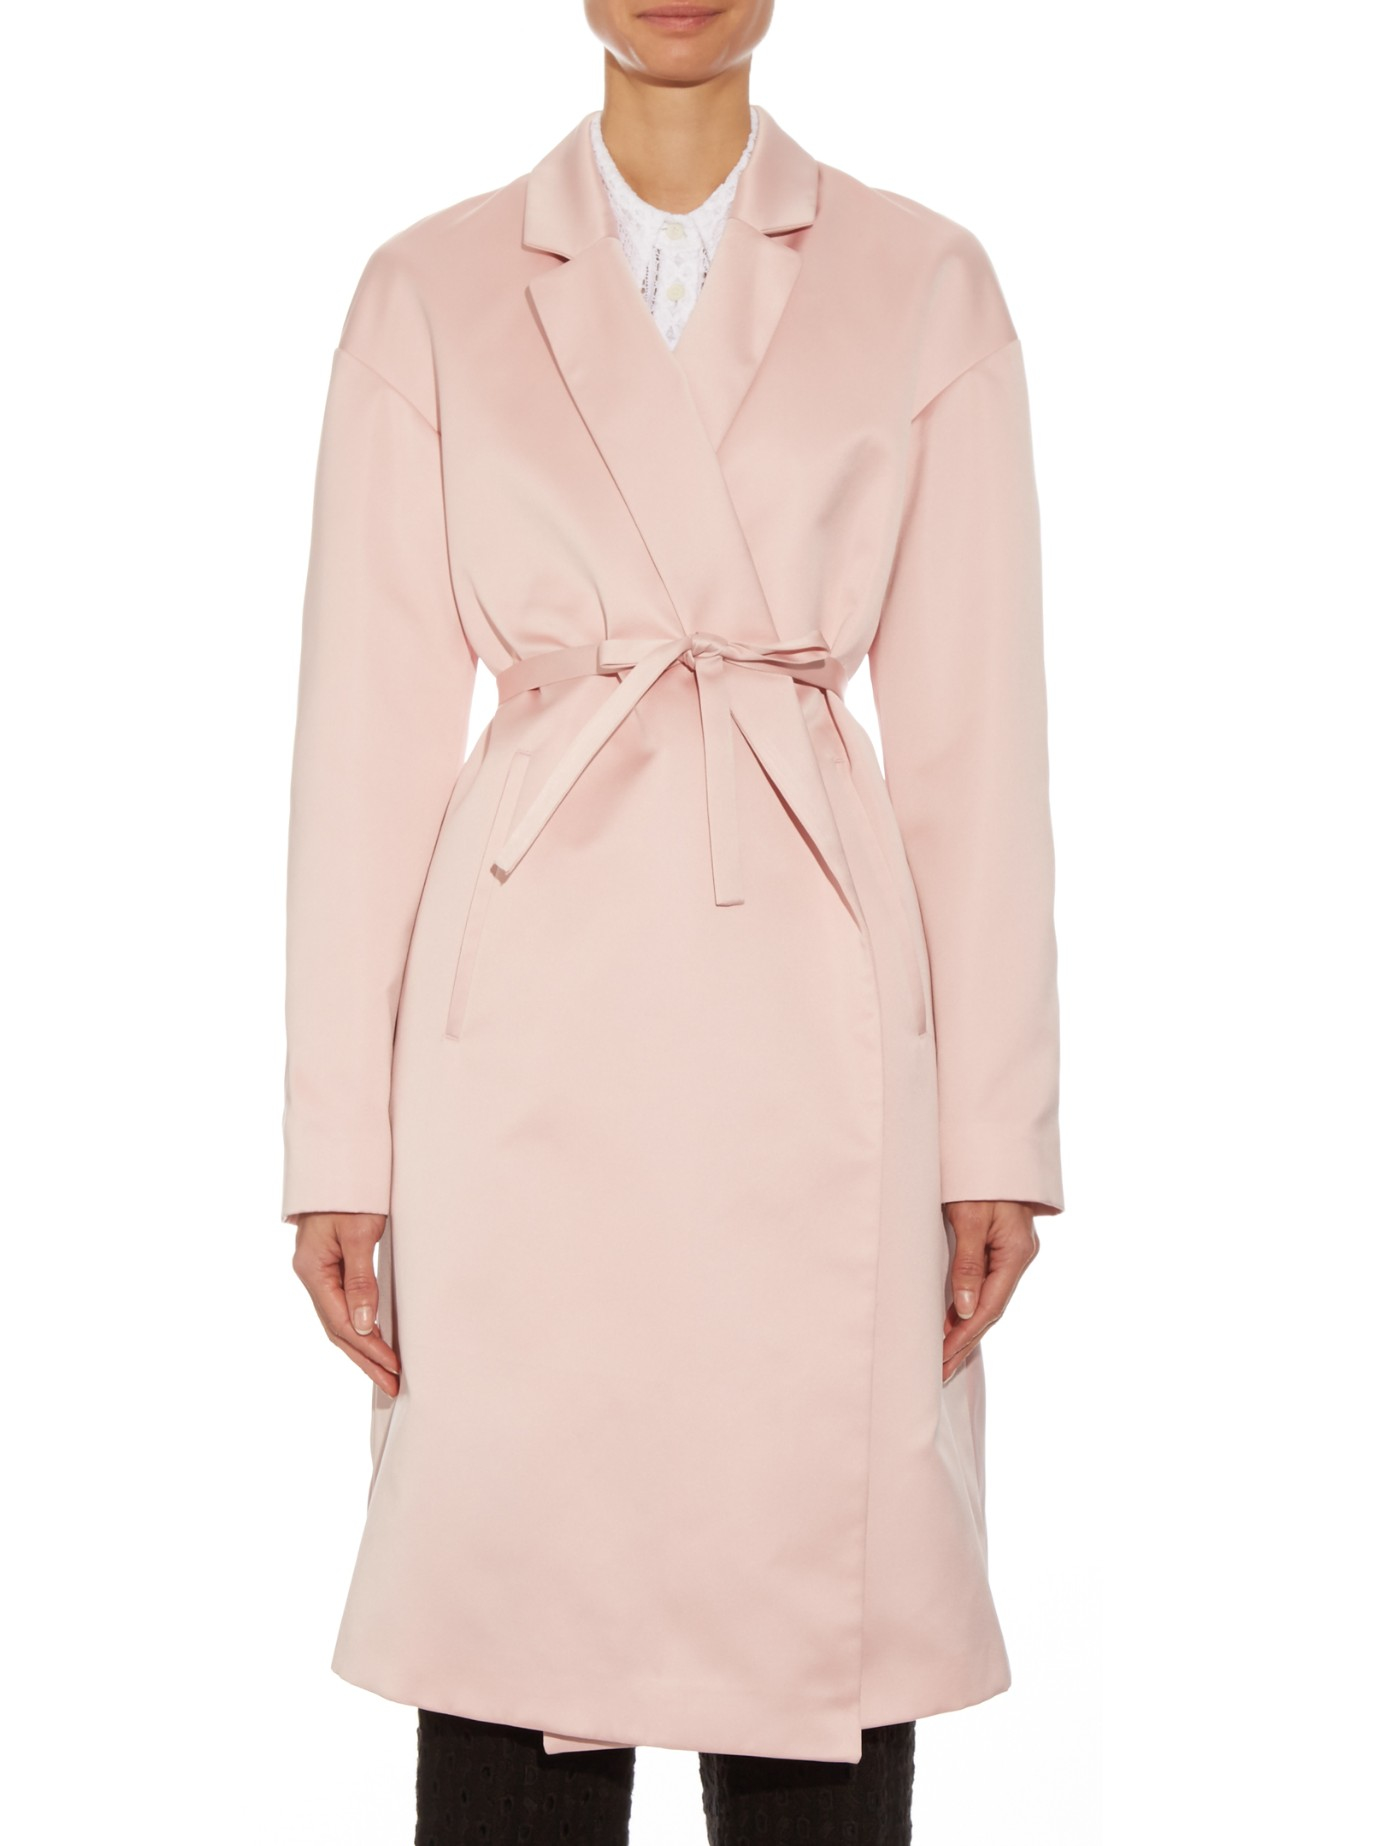 Rochas Self-tie Waist Duchess-satin Coat in Pink   Lyst